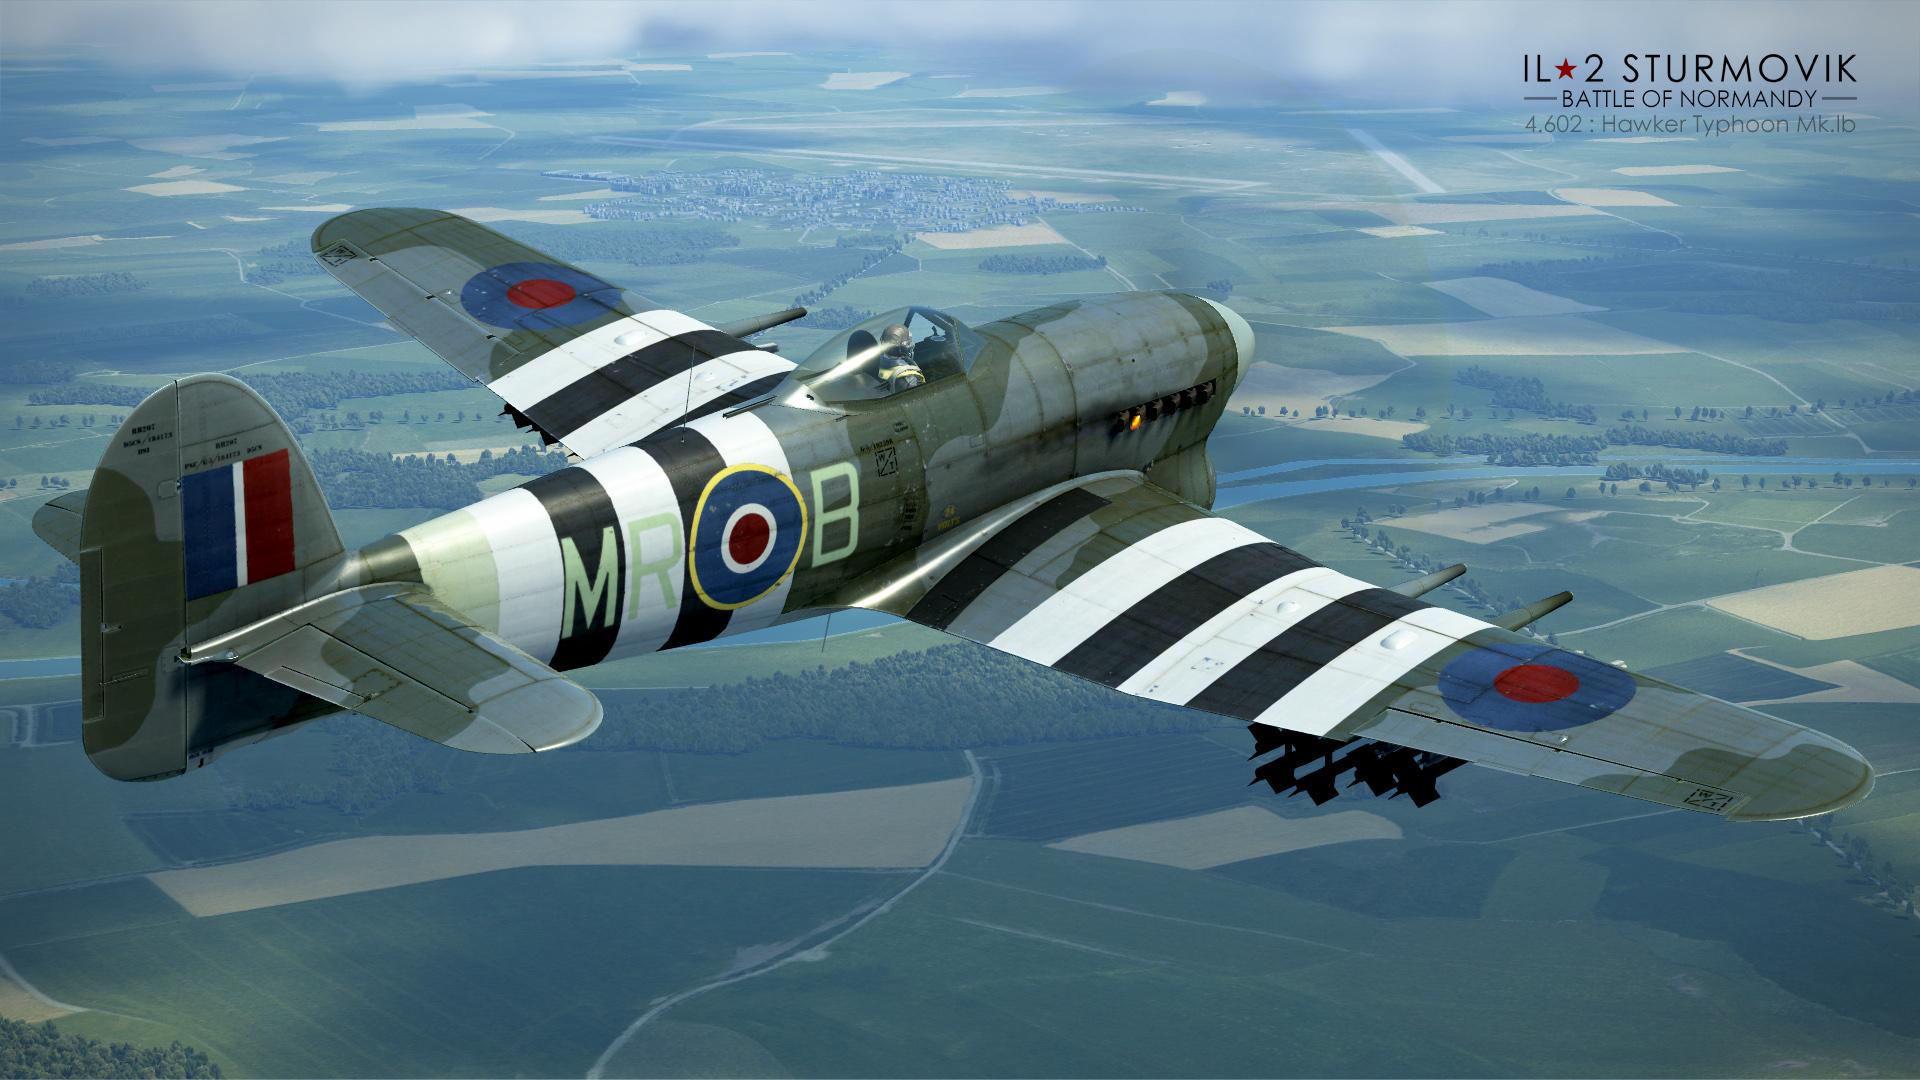 Forum JG300 Francophone IL2 Great Battles - Portail _Typh_0.jpg.78b708a2e2bbbb29ee9effeaee4c4bfe